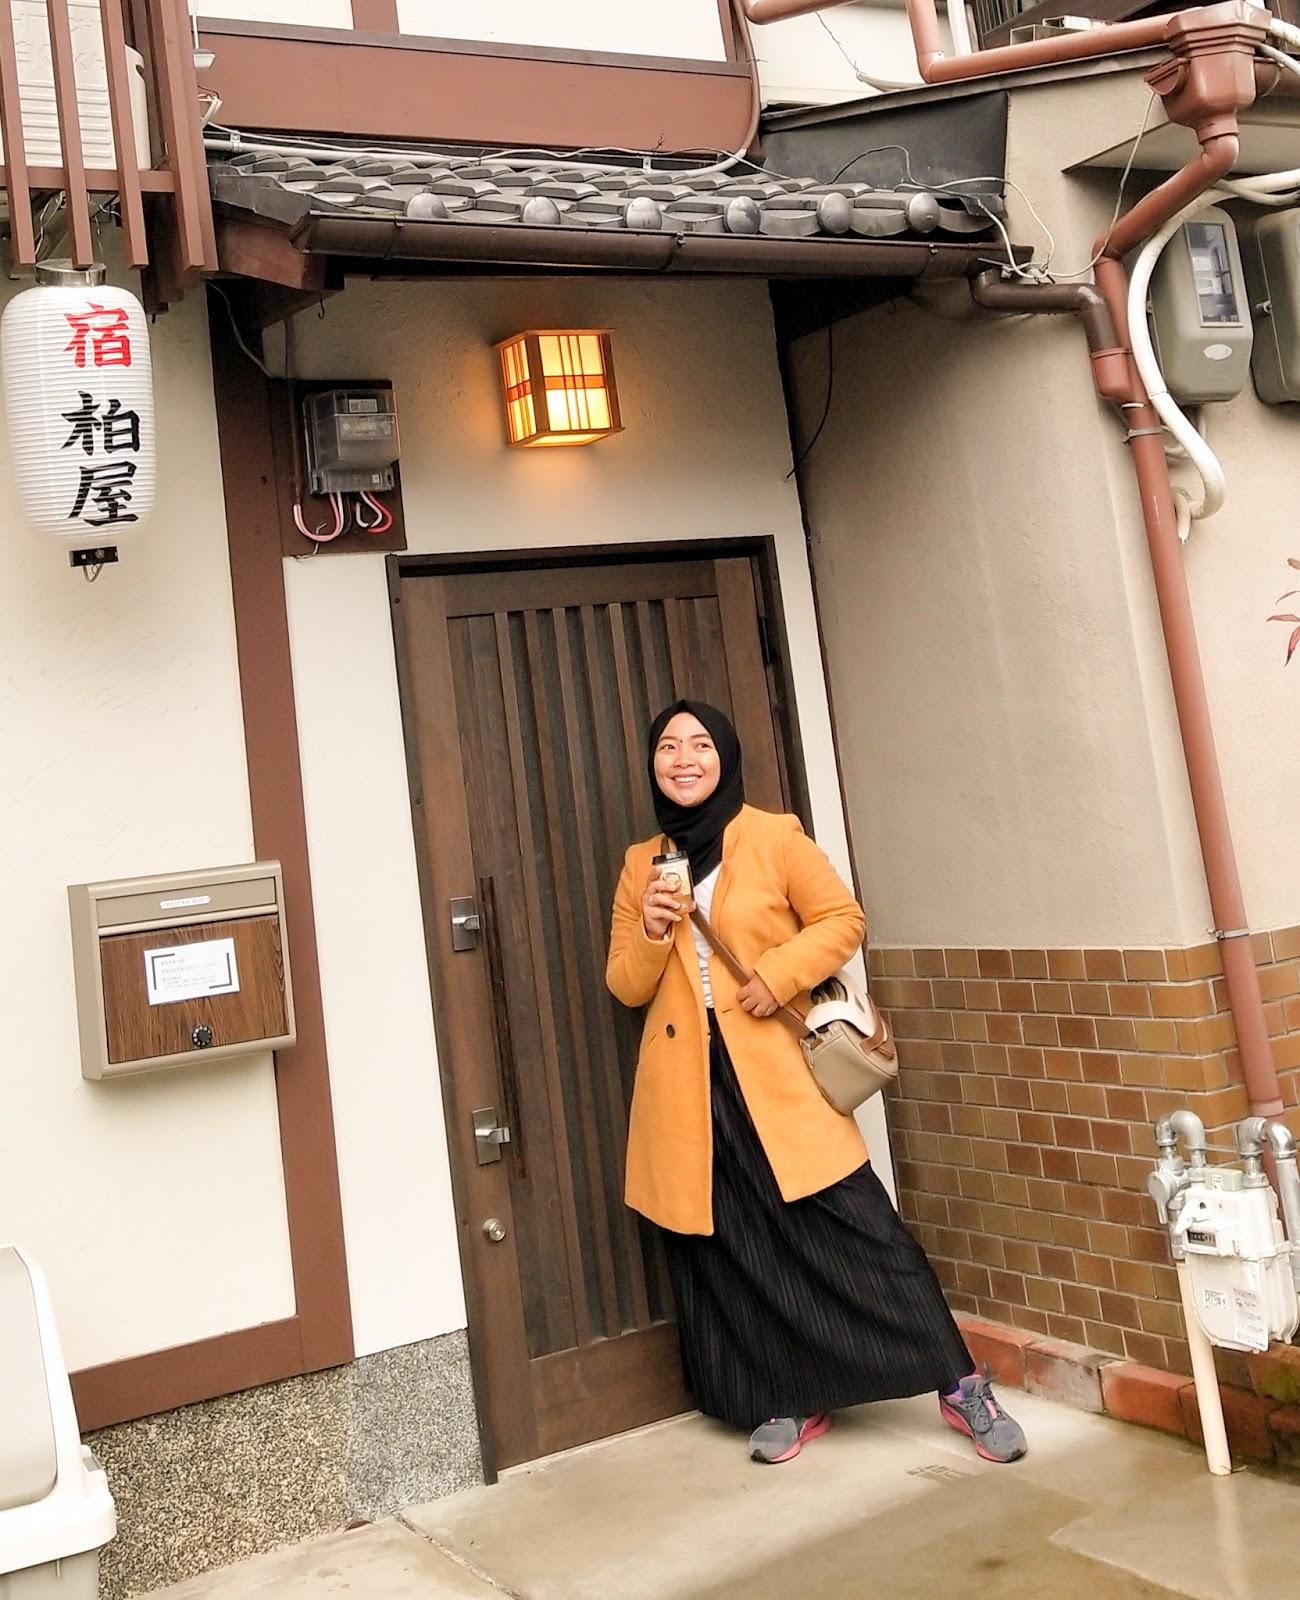 penginapan di kyoto, airbnb kyoto, wisata kuliner di kyoto